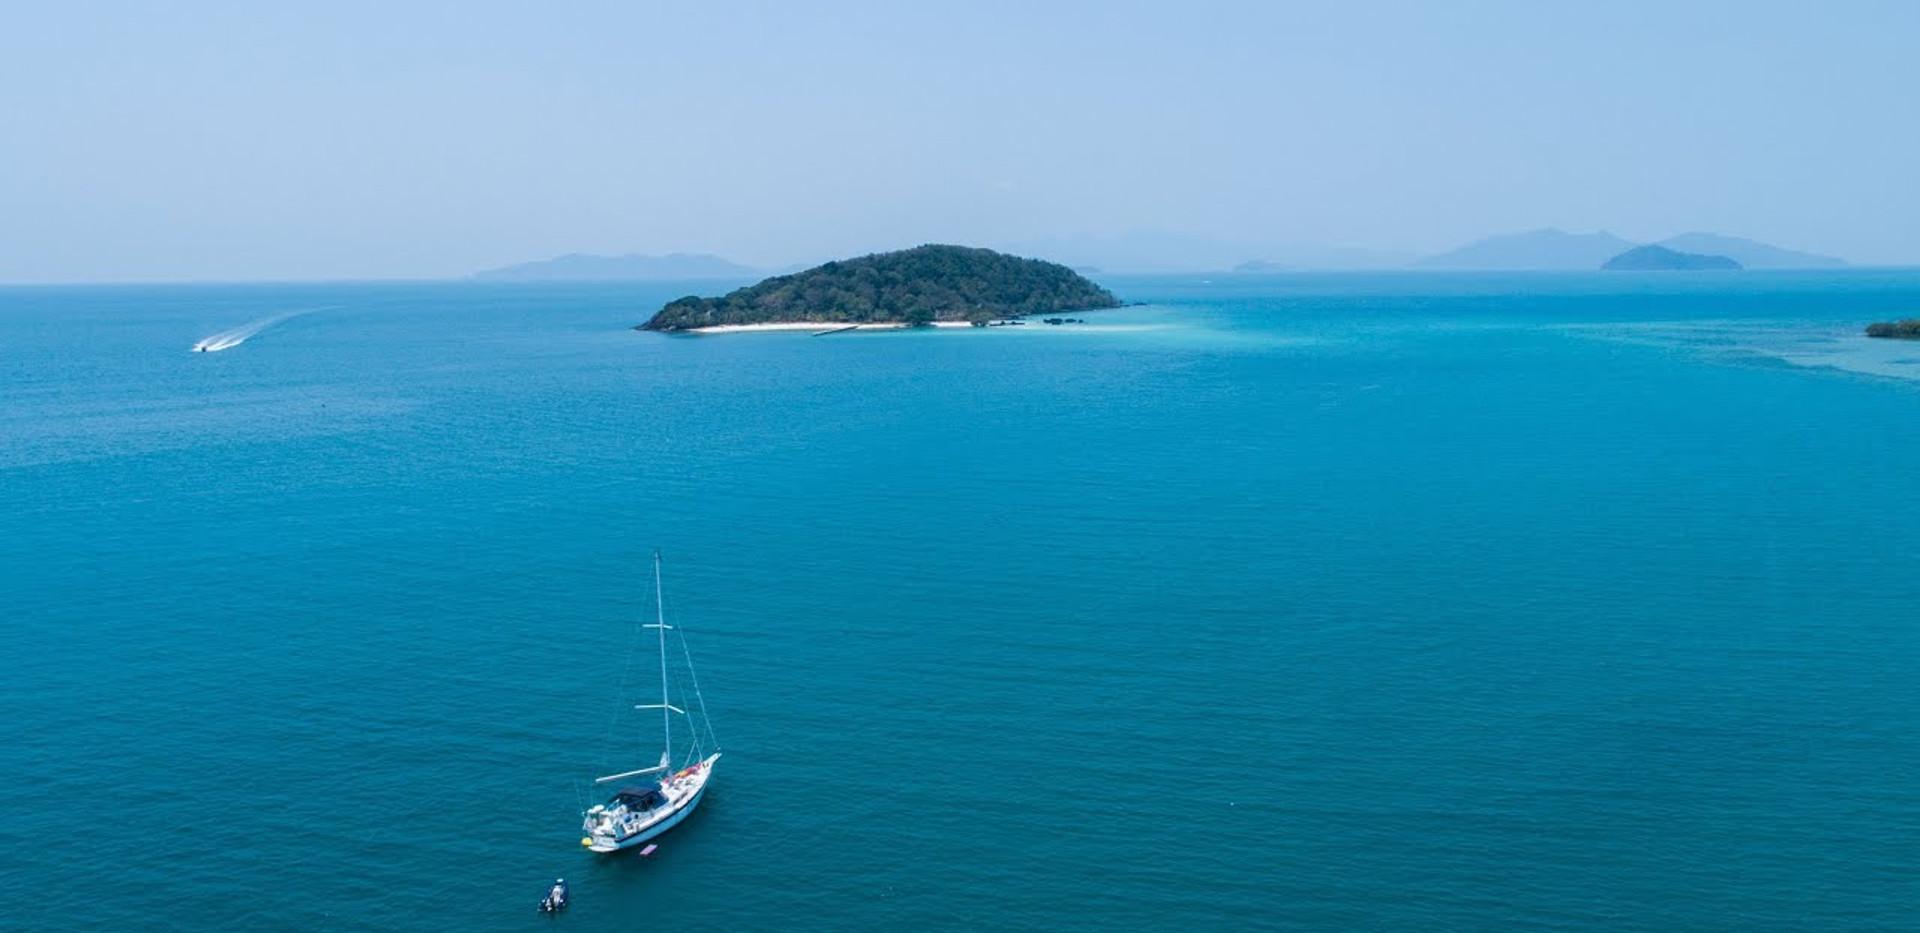 Thailand Yoga Holidays Destination Paradise Island video